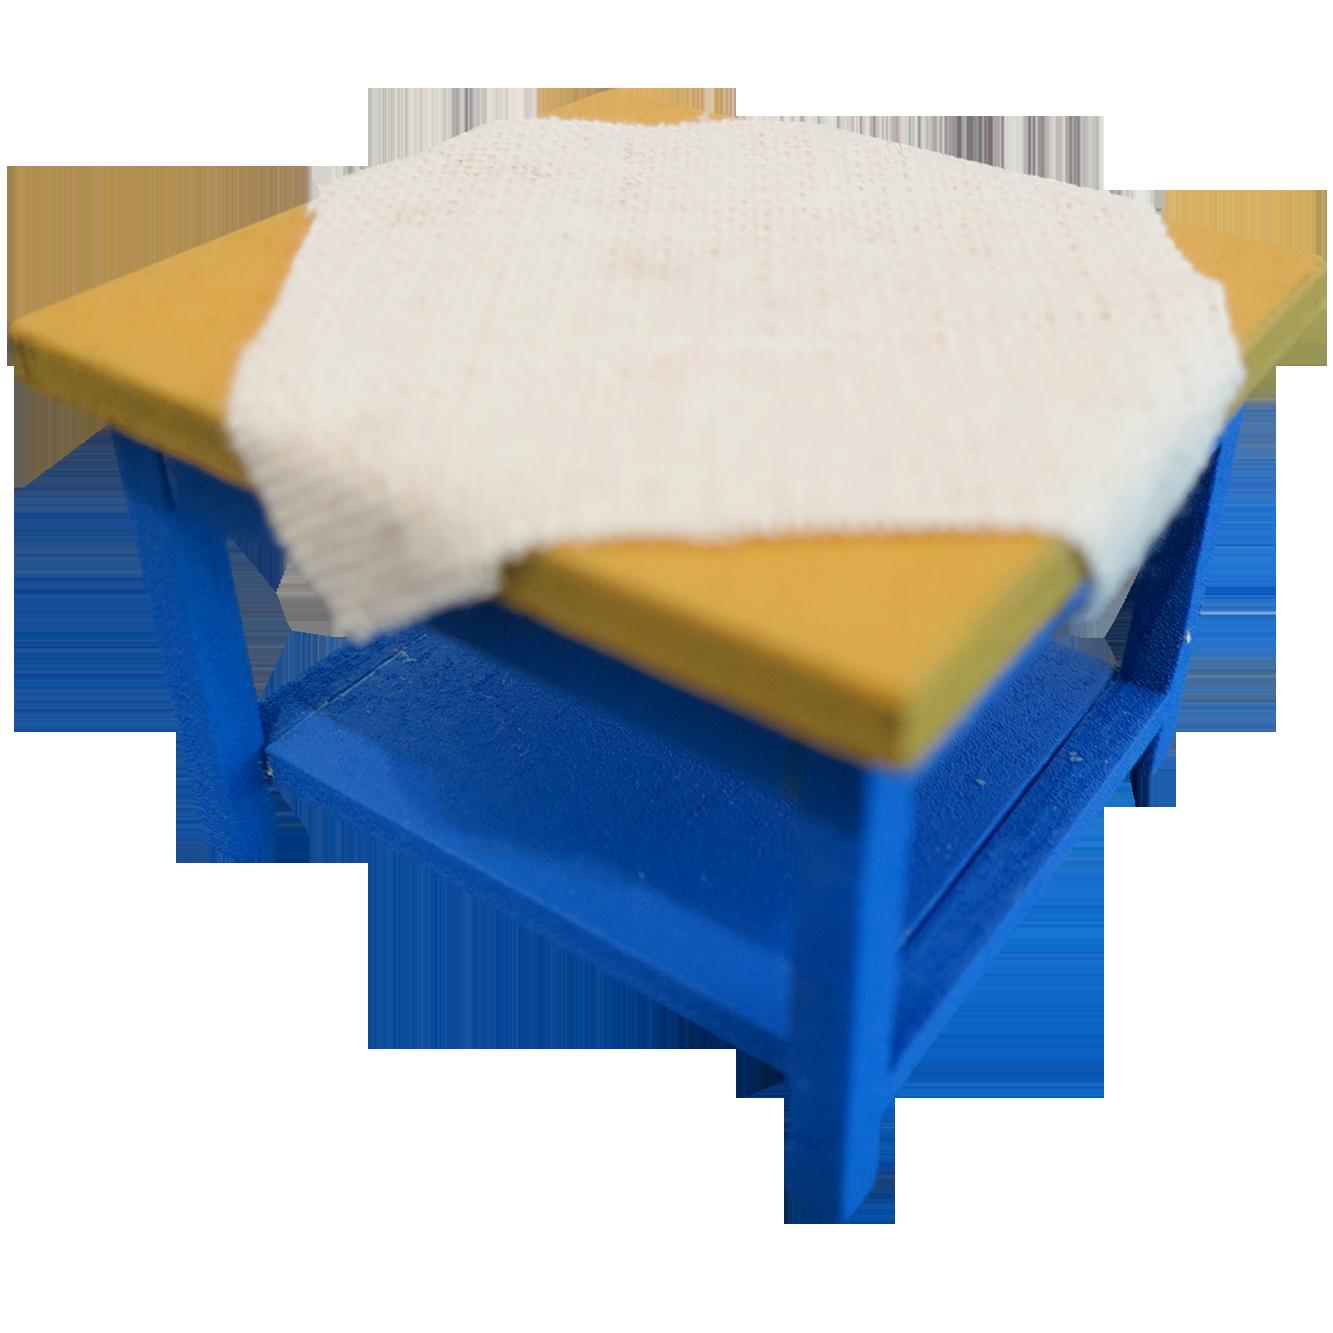 Miniature kit pre sen. Ladder clipart step stool